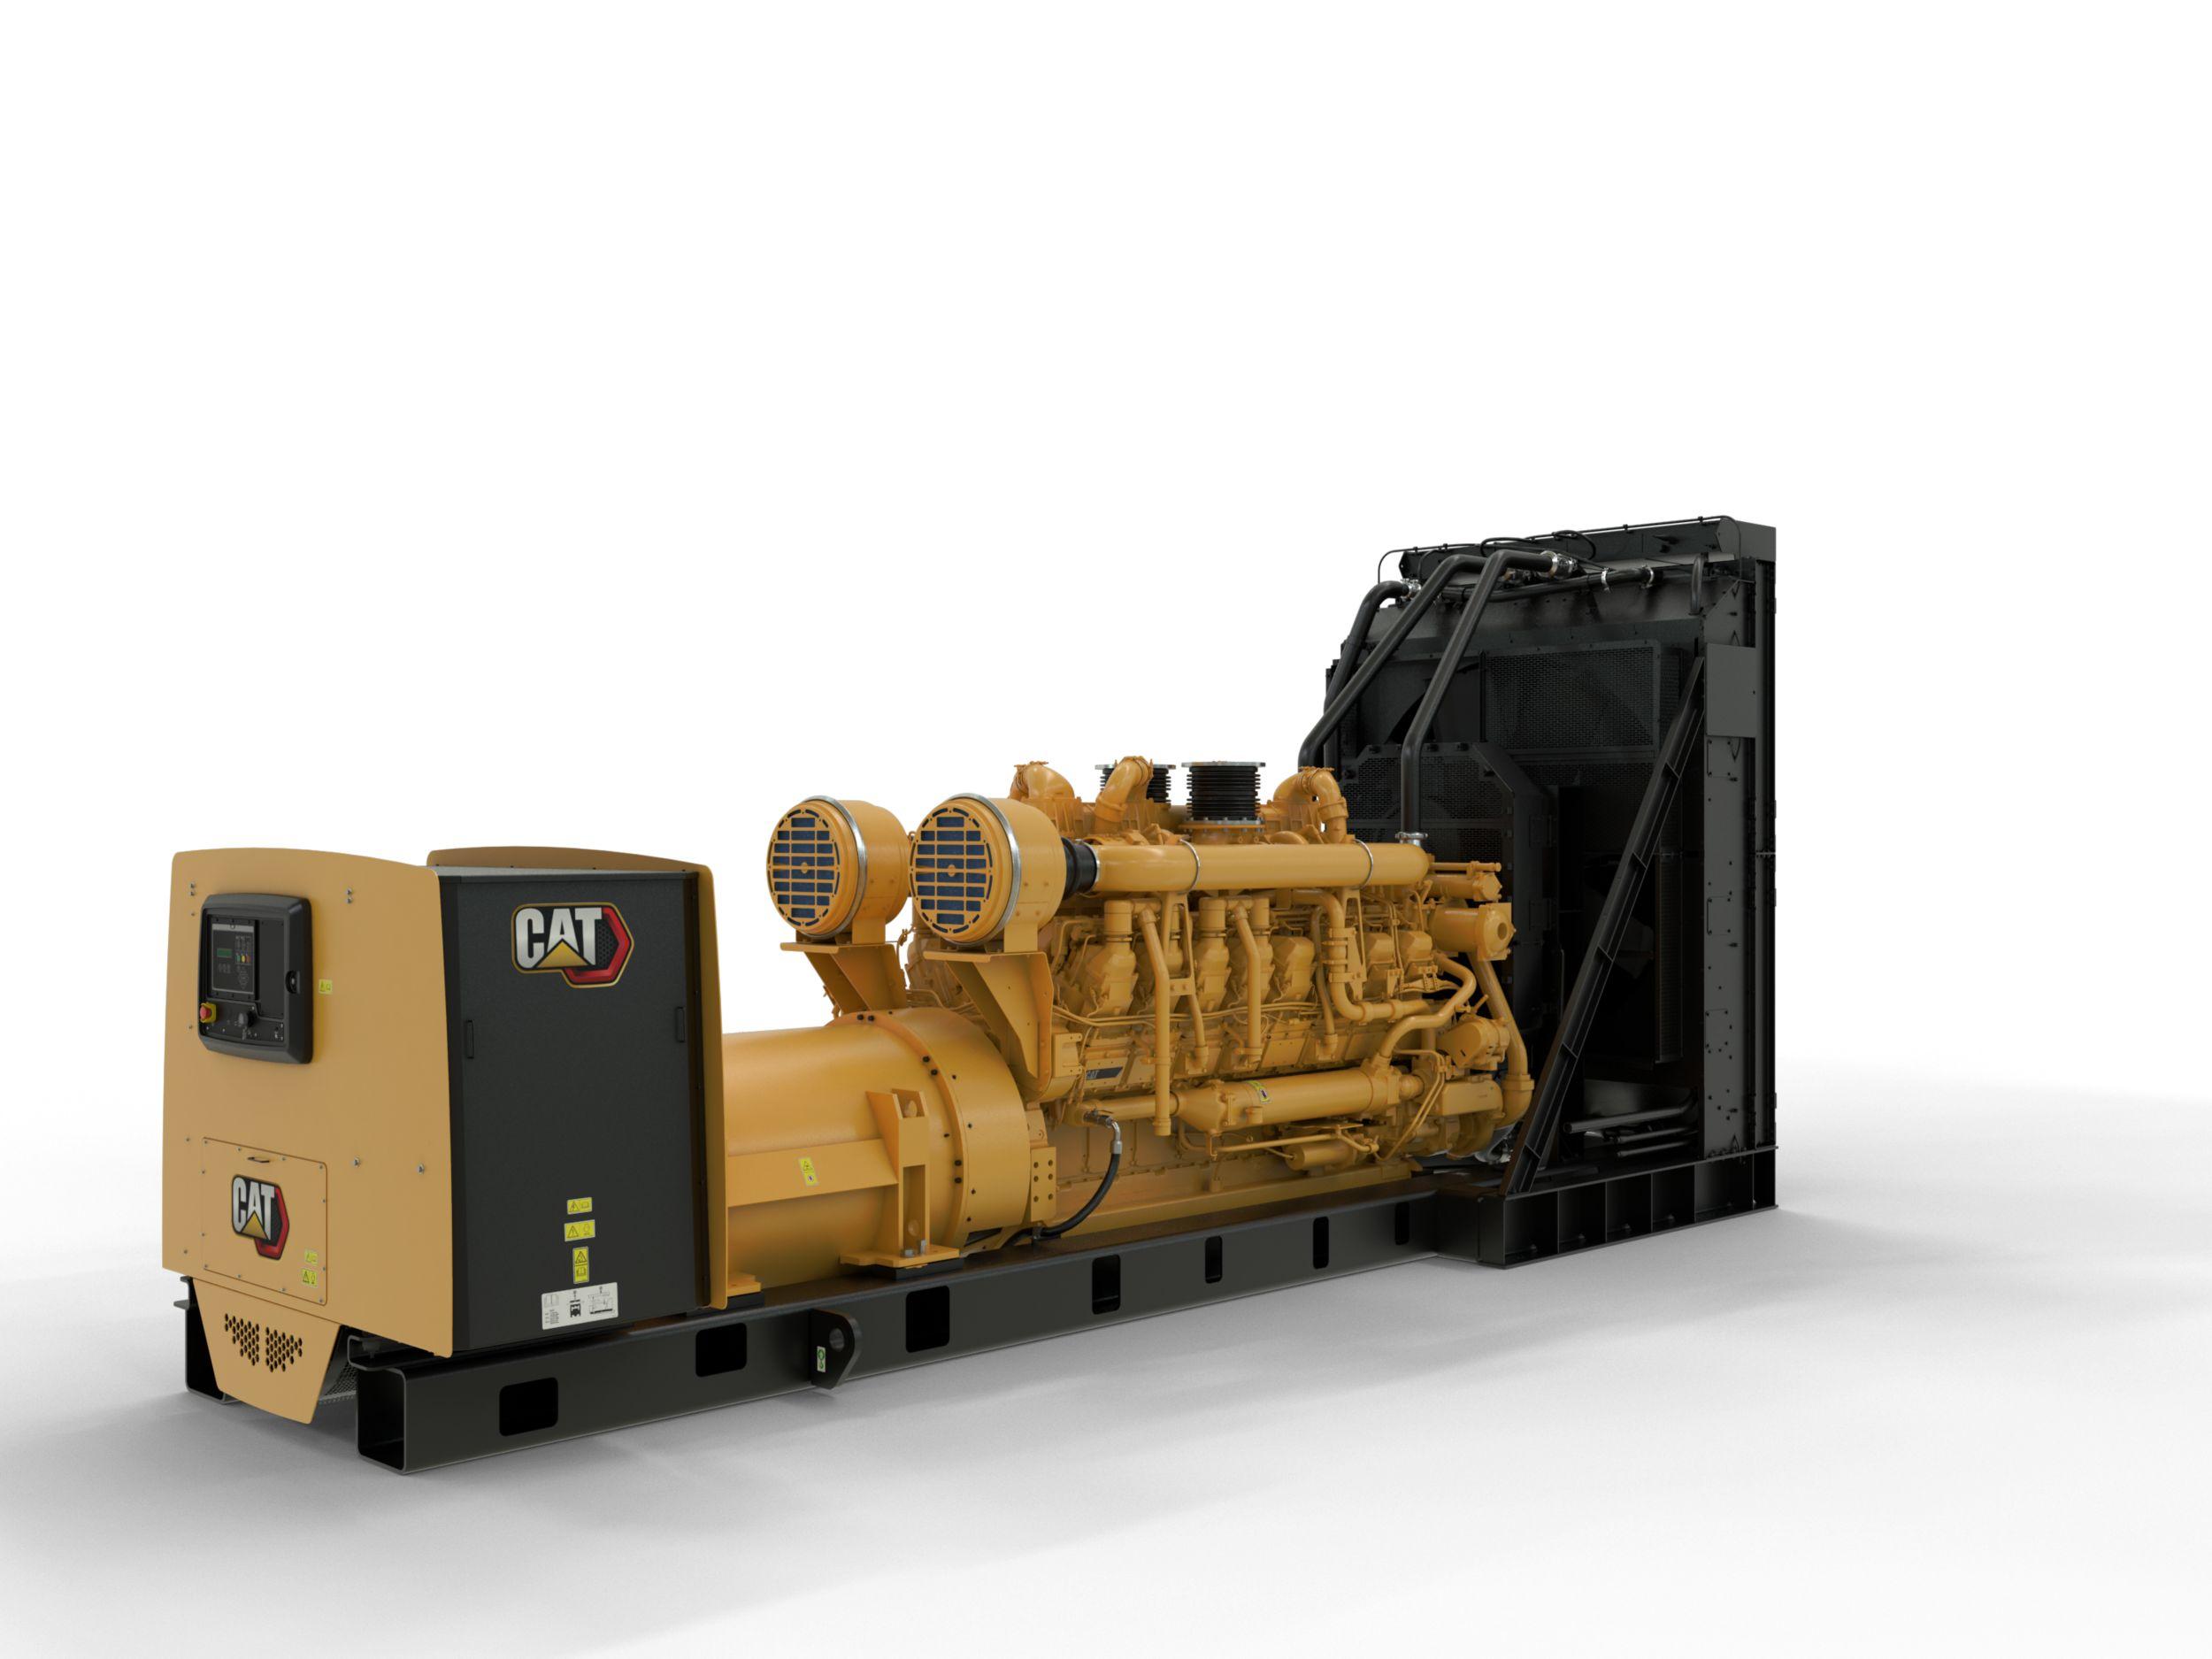 3516E Low Voltage Generator Set